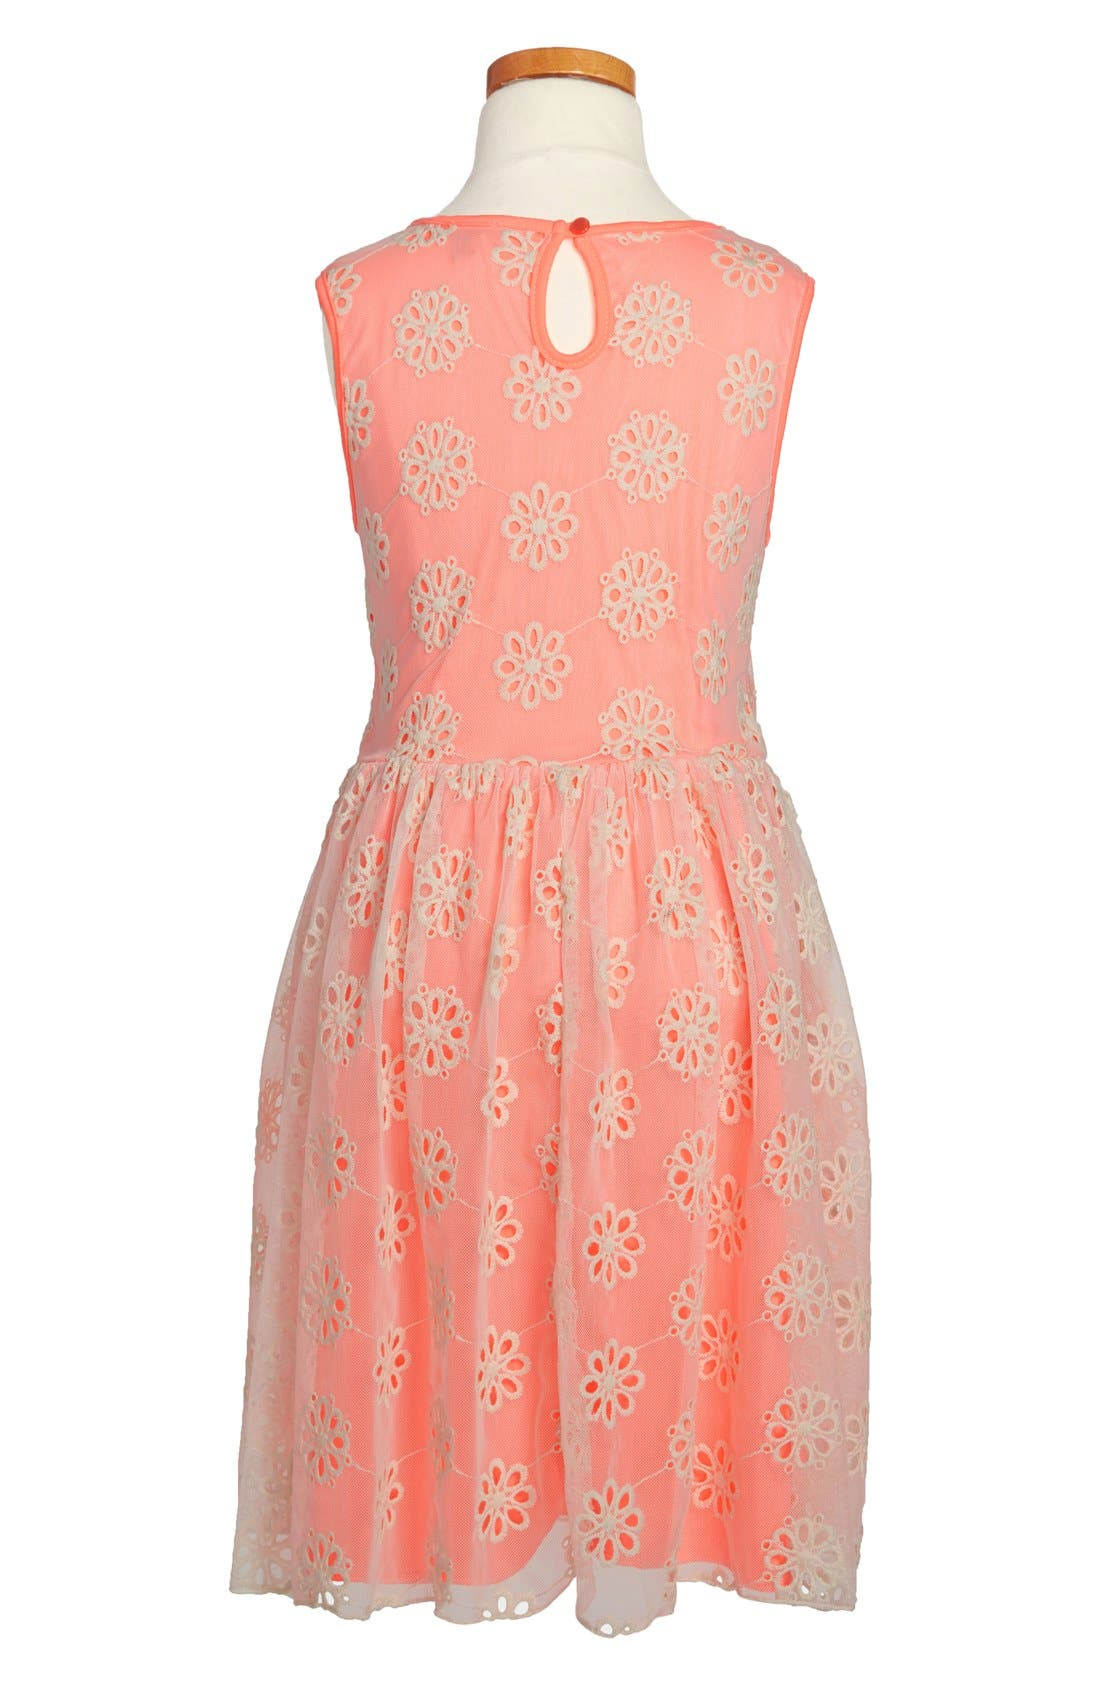 Alternate Image 2  - Zunie Embroidered Sleeveless Dress (Little Girls & Big Girls)